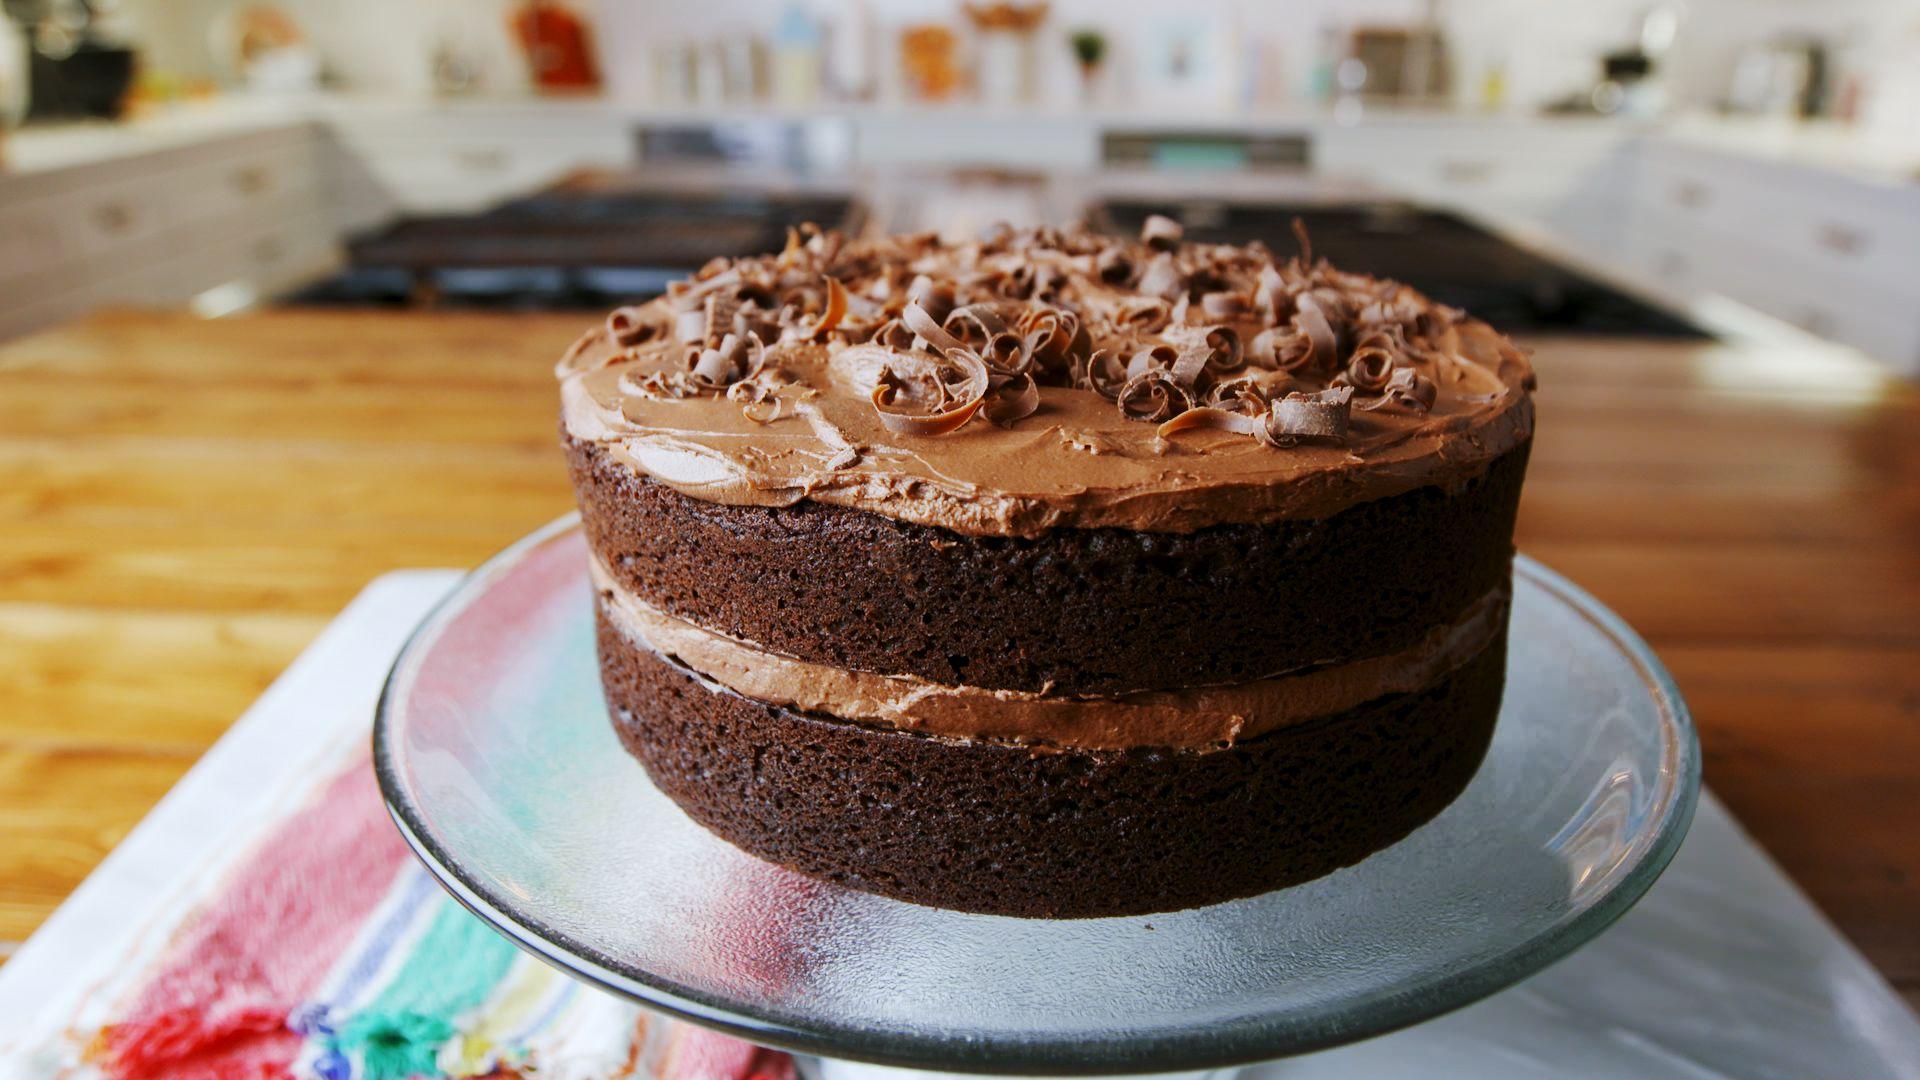 Best-Ever Chocolate Cake